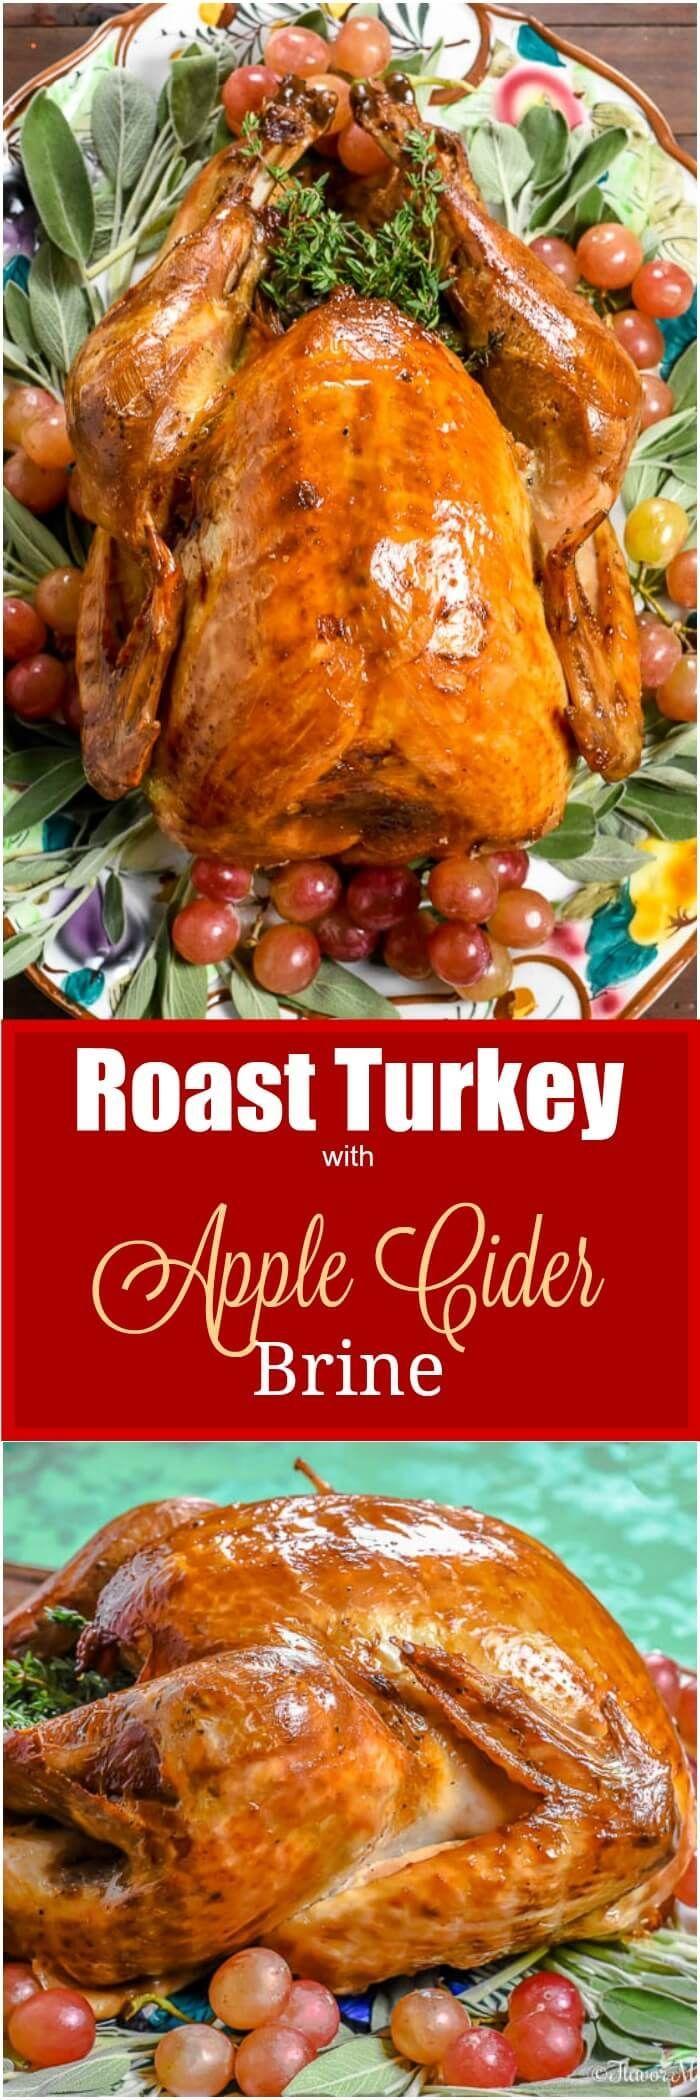 This Roast Turkey with Apple Cider Brine is a moist, juicy turkey for our Thanksgiving table. @honestturkey #honestturkey #700Reasons #ad via @flavormosaic